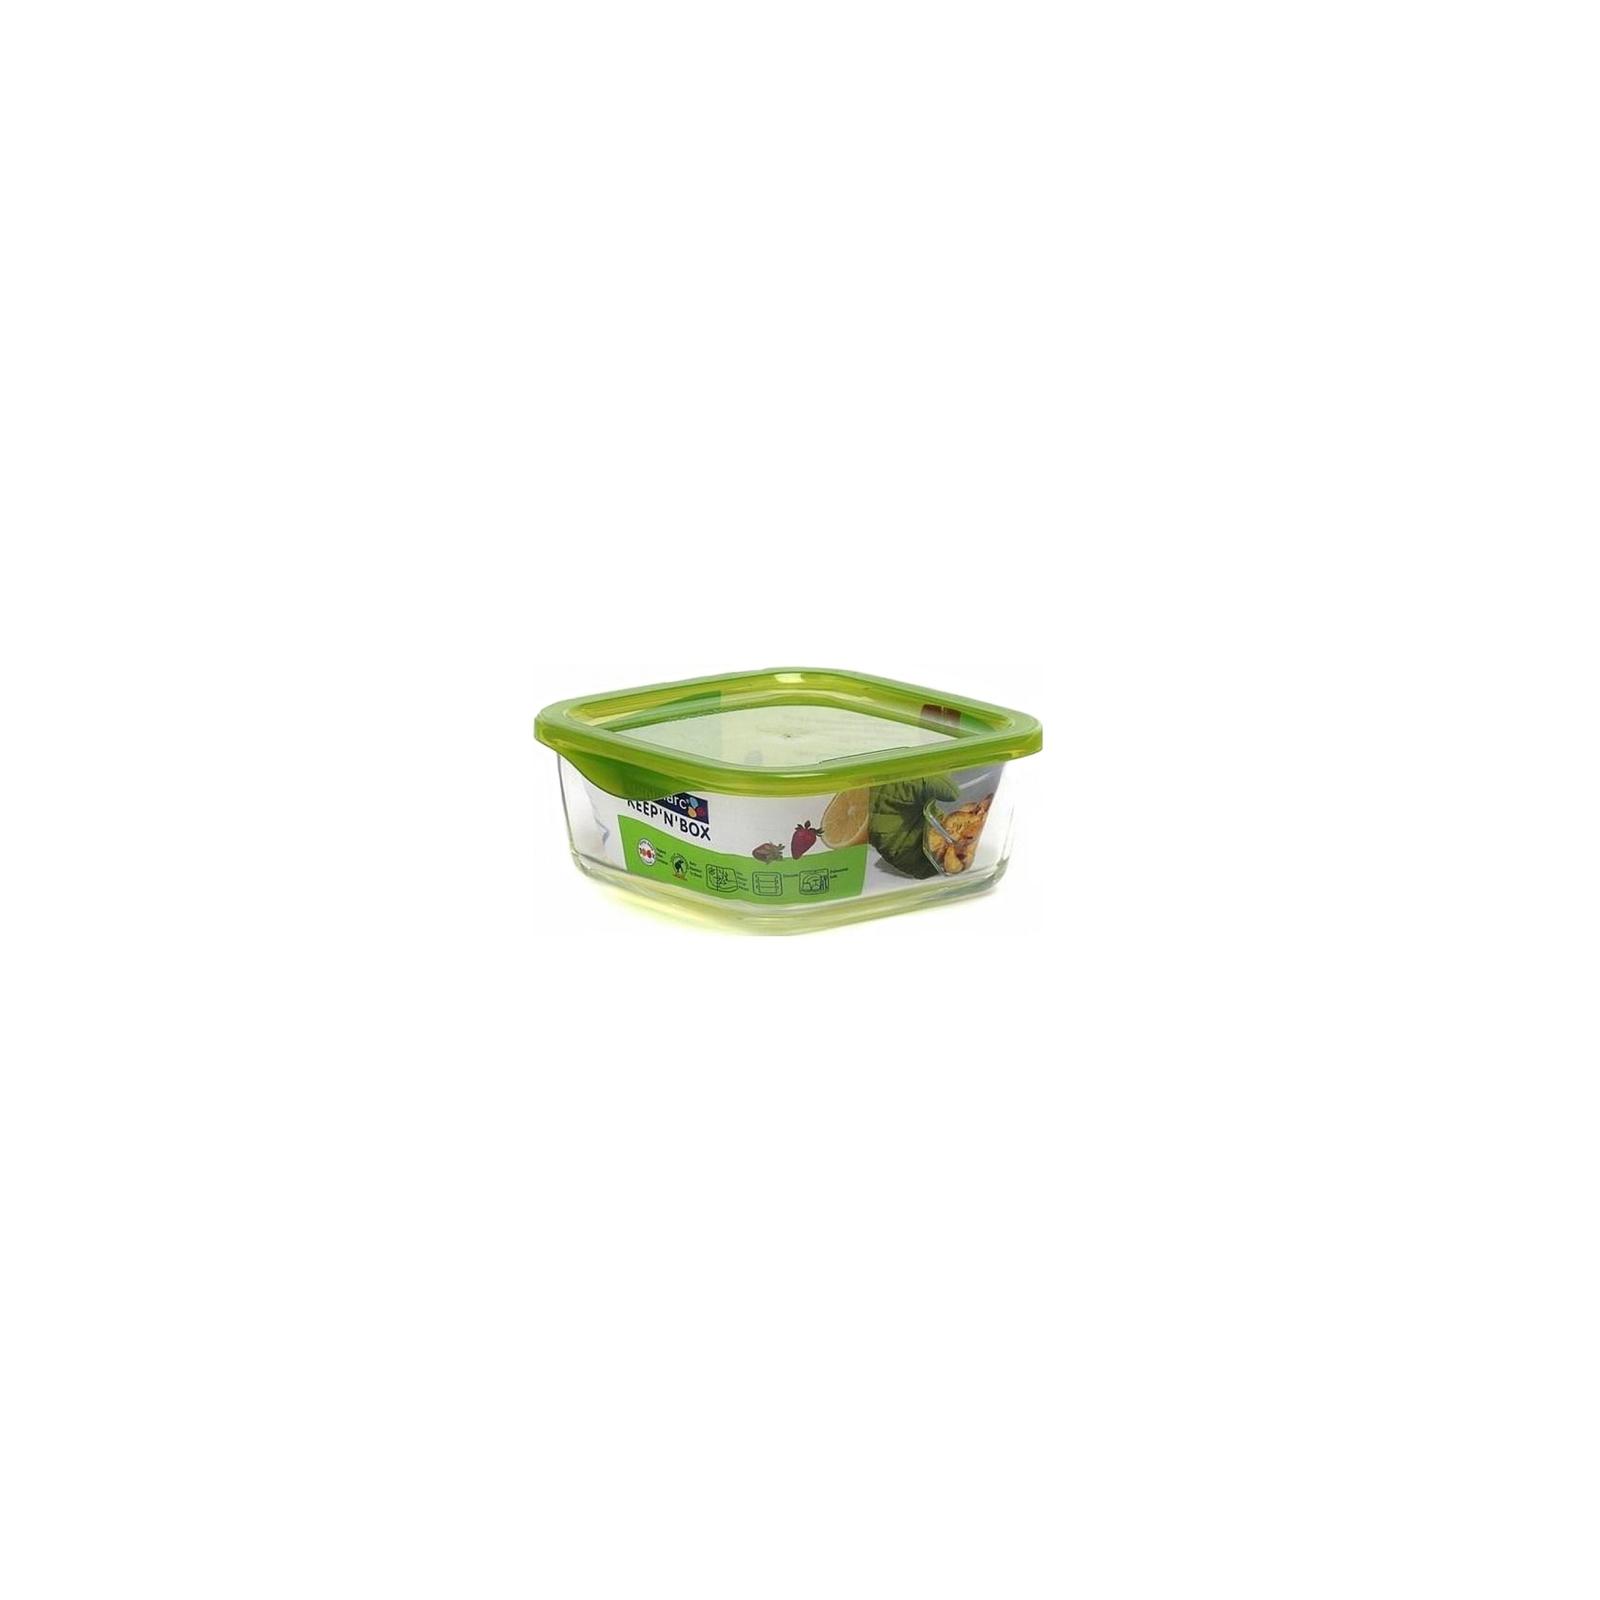 Пищевой контейнер Luminarc Keep'n Box квадр. 380 мл (P4525)